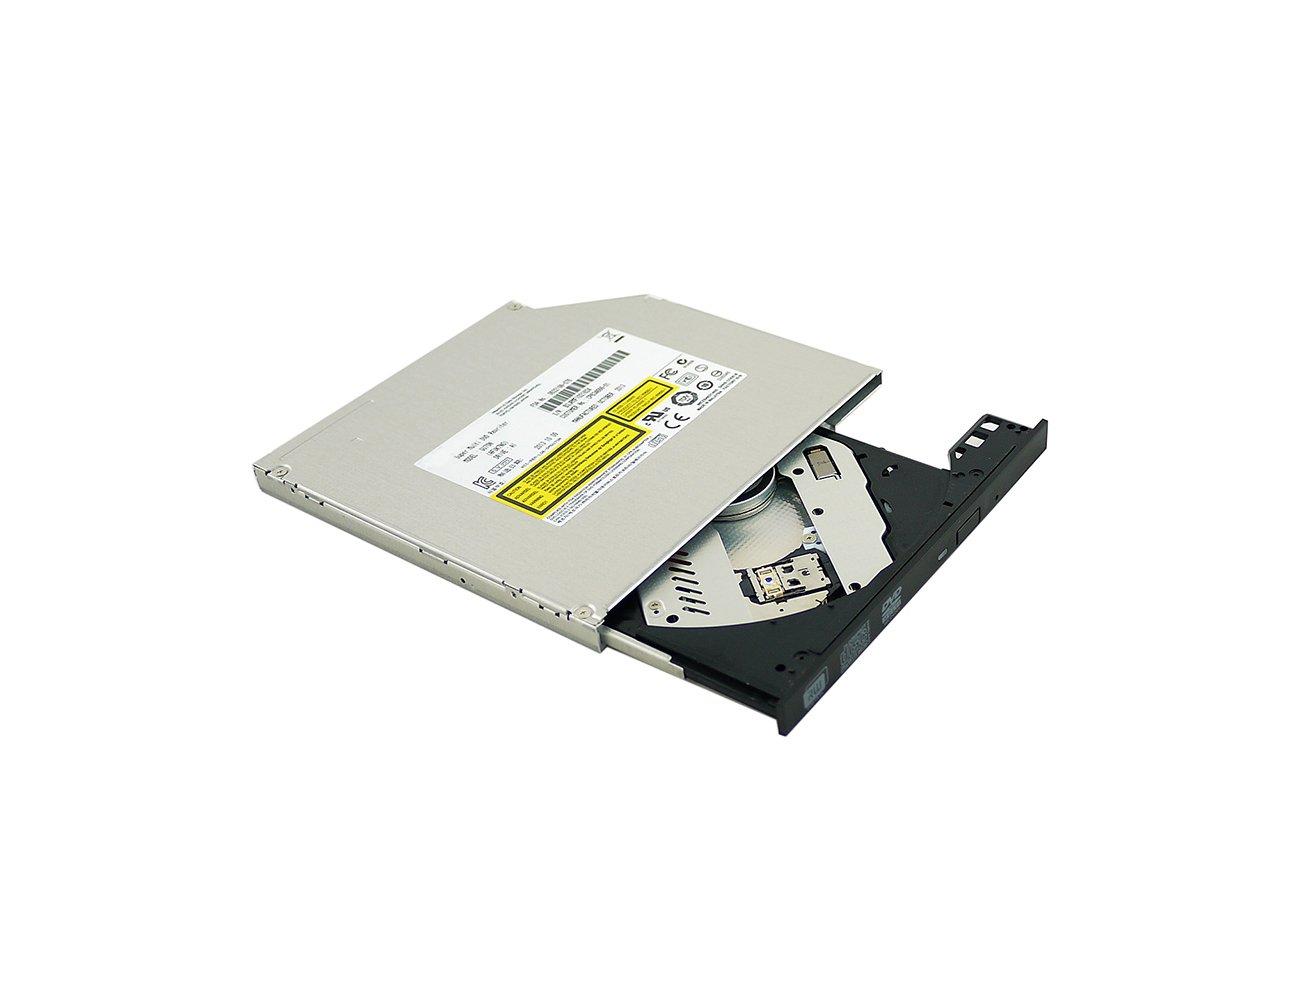 HL-DT-ST DVDRAM GSA-H42N drivers for windows xp